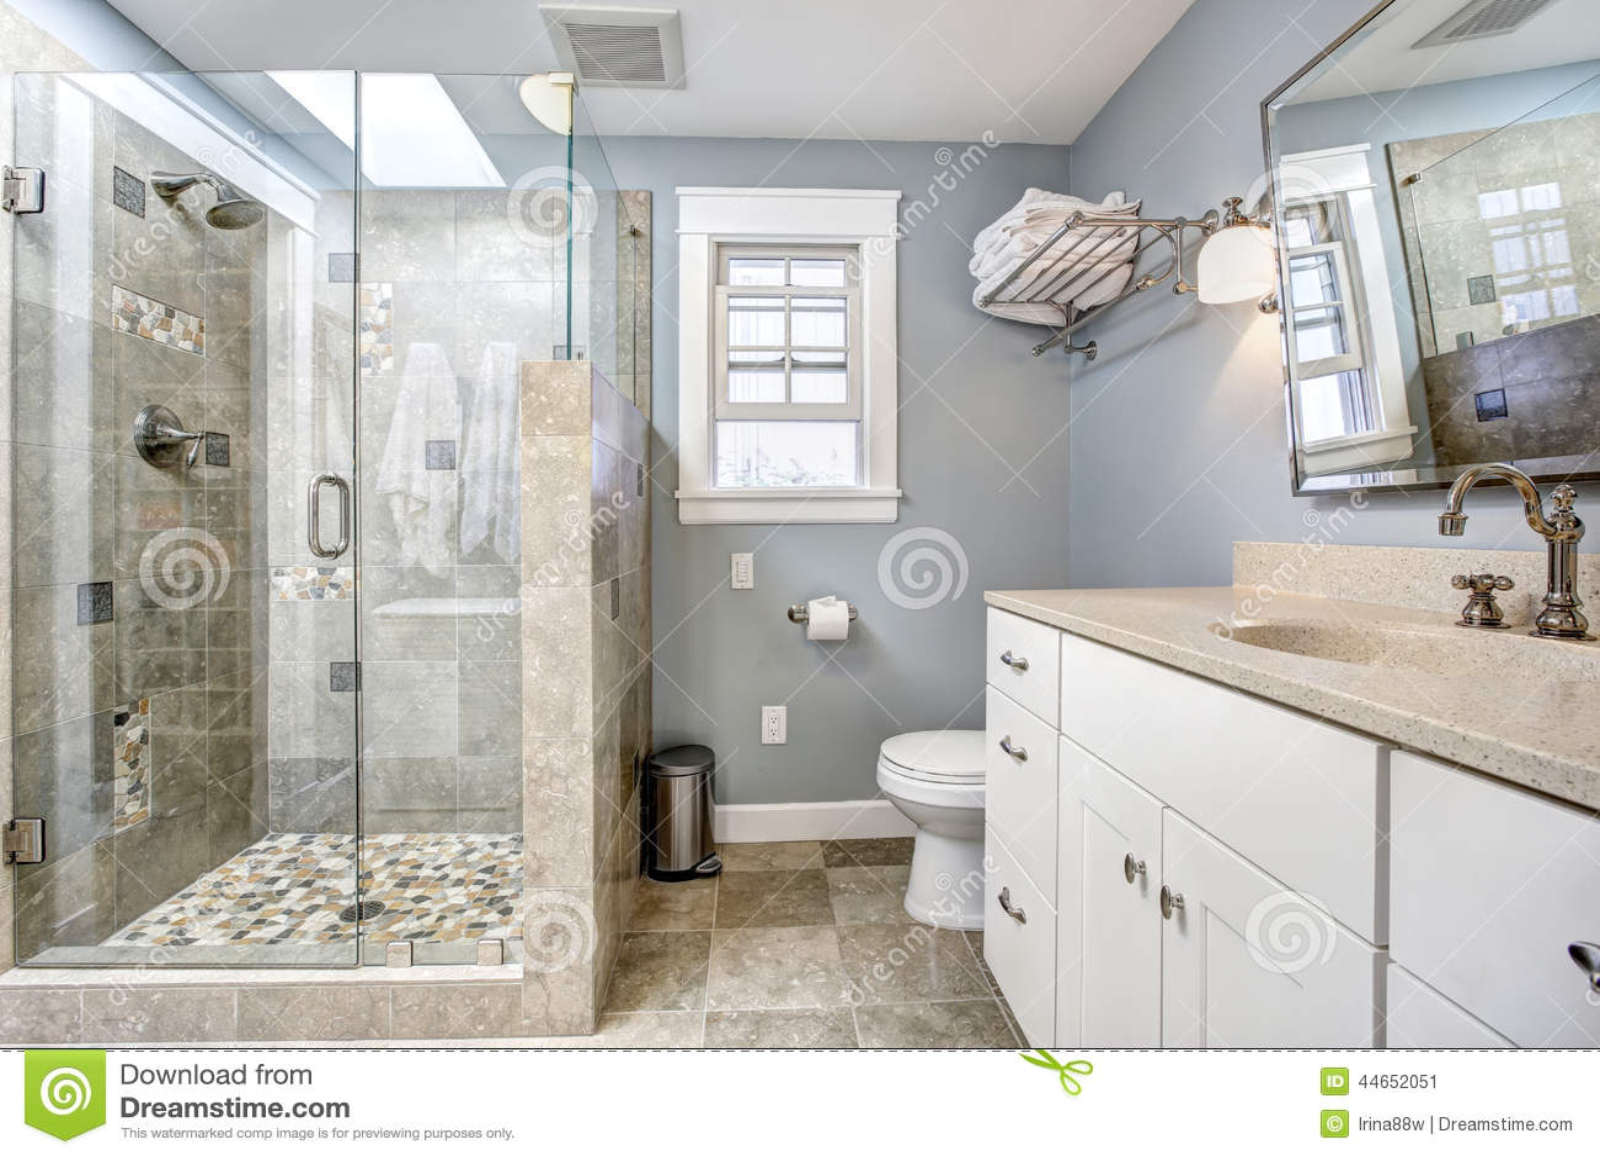 Bagni con doccia moderni pc26 regardsdefemmes - Bagni con doccia moderni ...